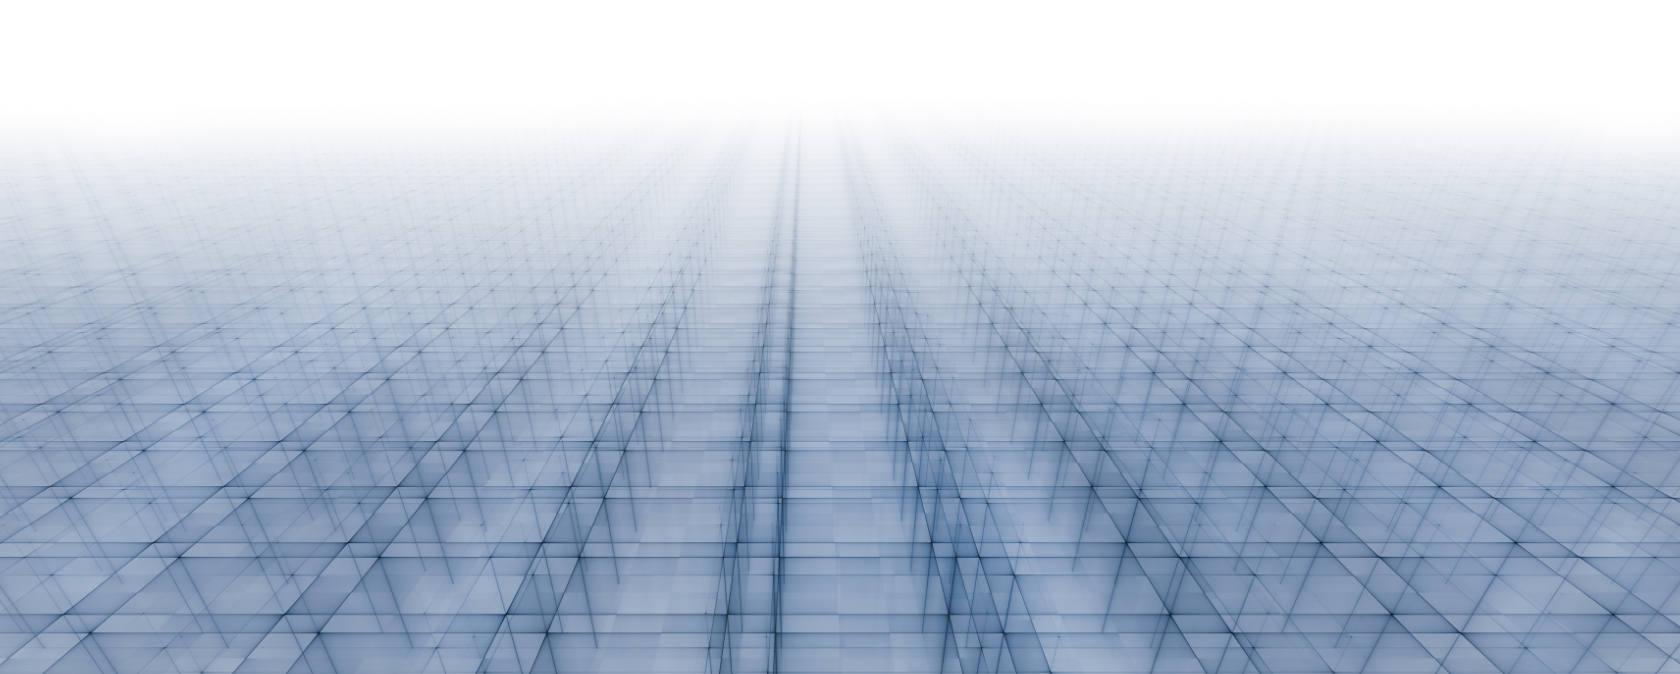 Overview of a futuristic server farm